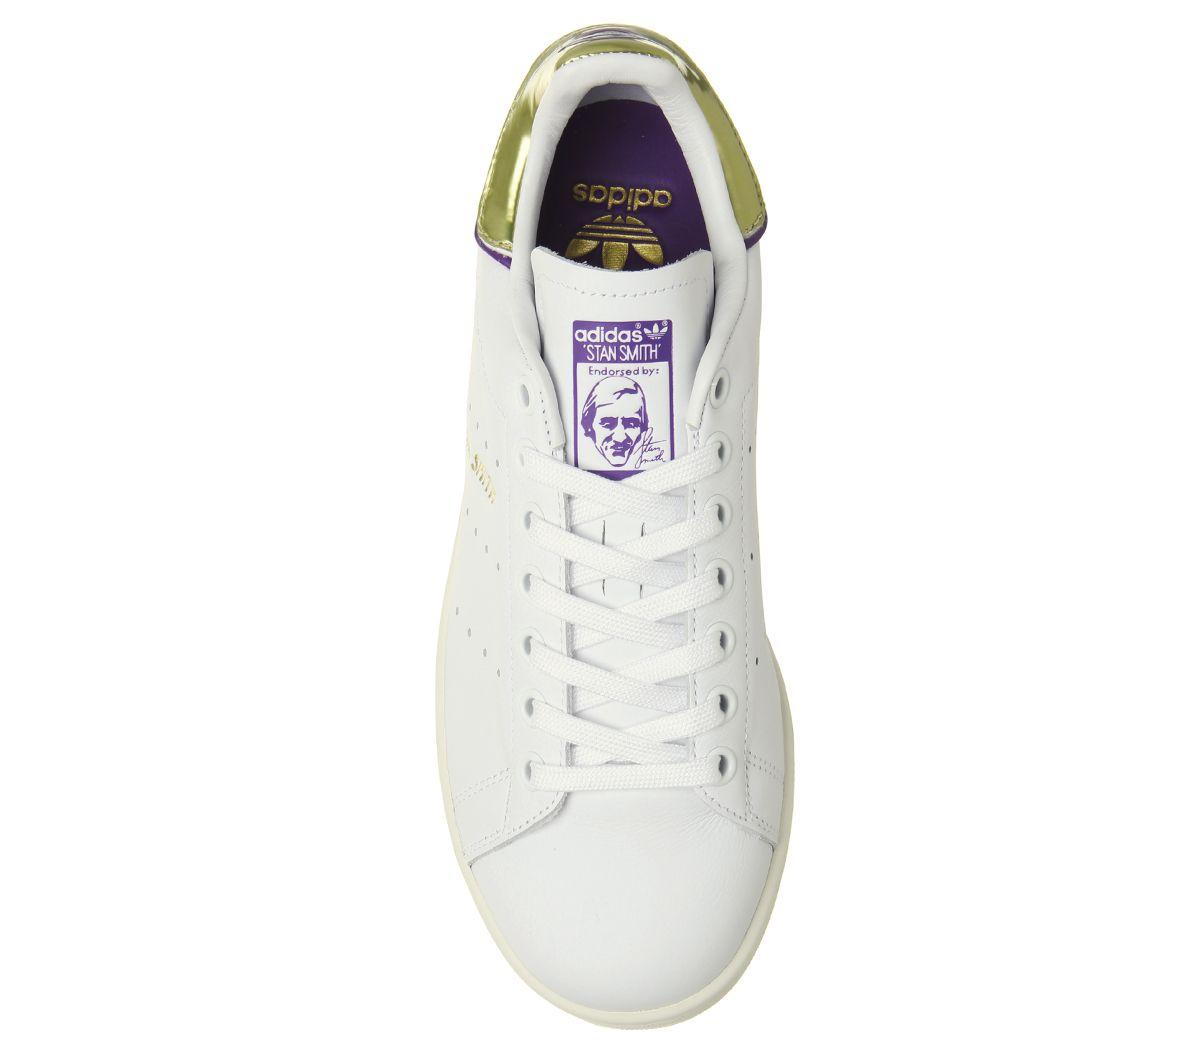 new product 44eca 7d4f8 Sentinel Womens Adidas Stan Smith Trainers Off White Purple Gold Metallic  Elizbeth Tfl Tr